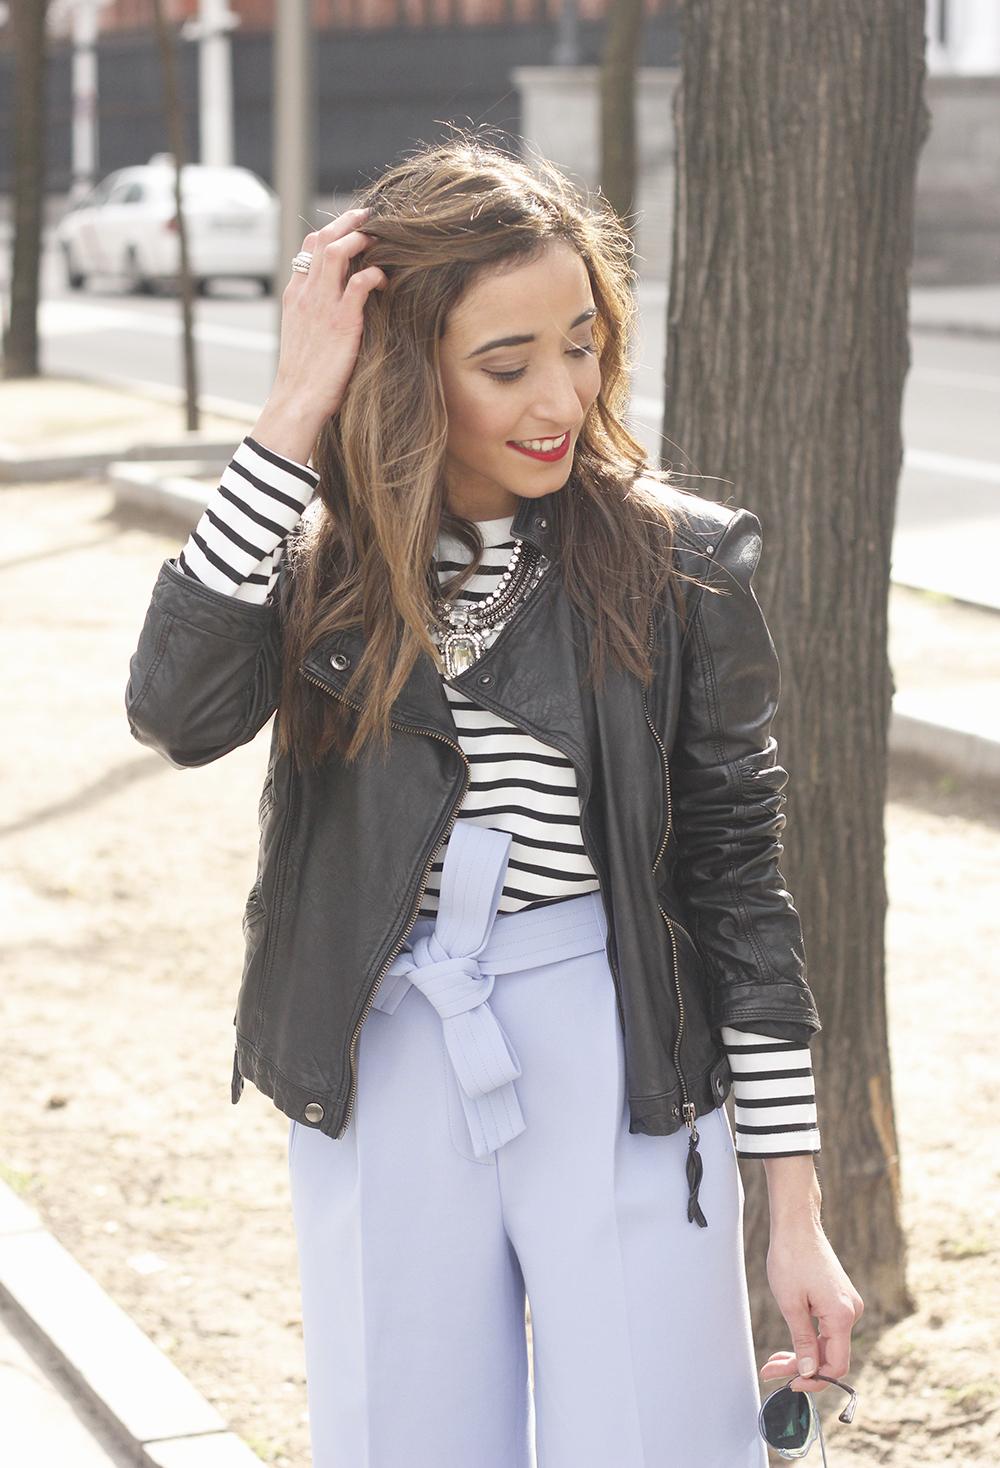 Light Blue Pallazzo pants t-shirt stripes black heels biker jacket dior so real sunglasses outfit style fashion11